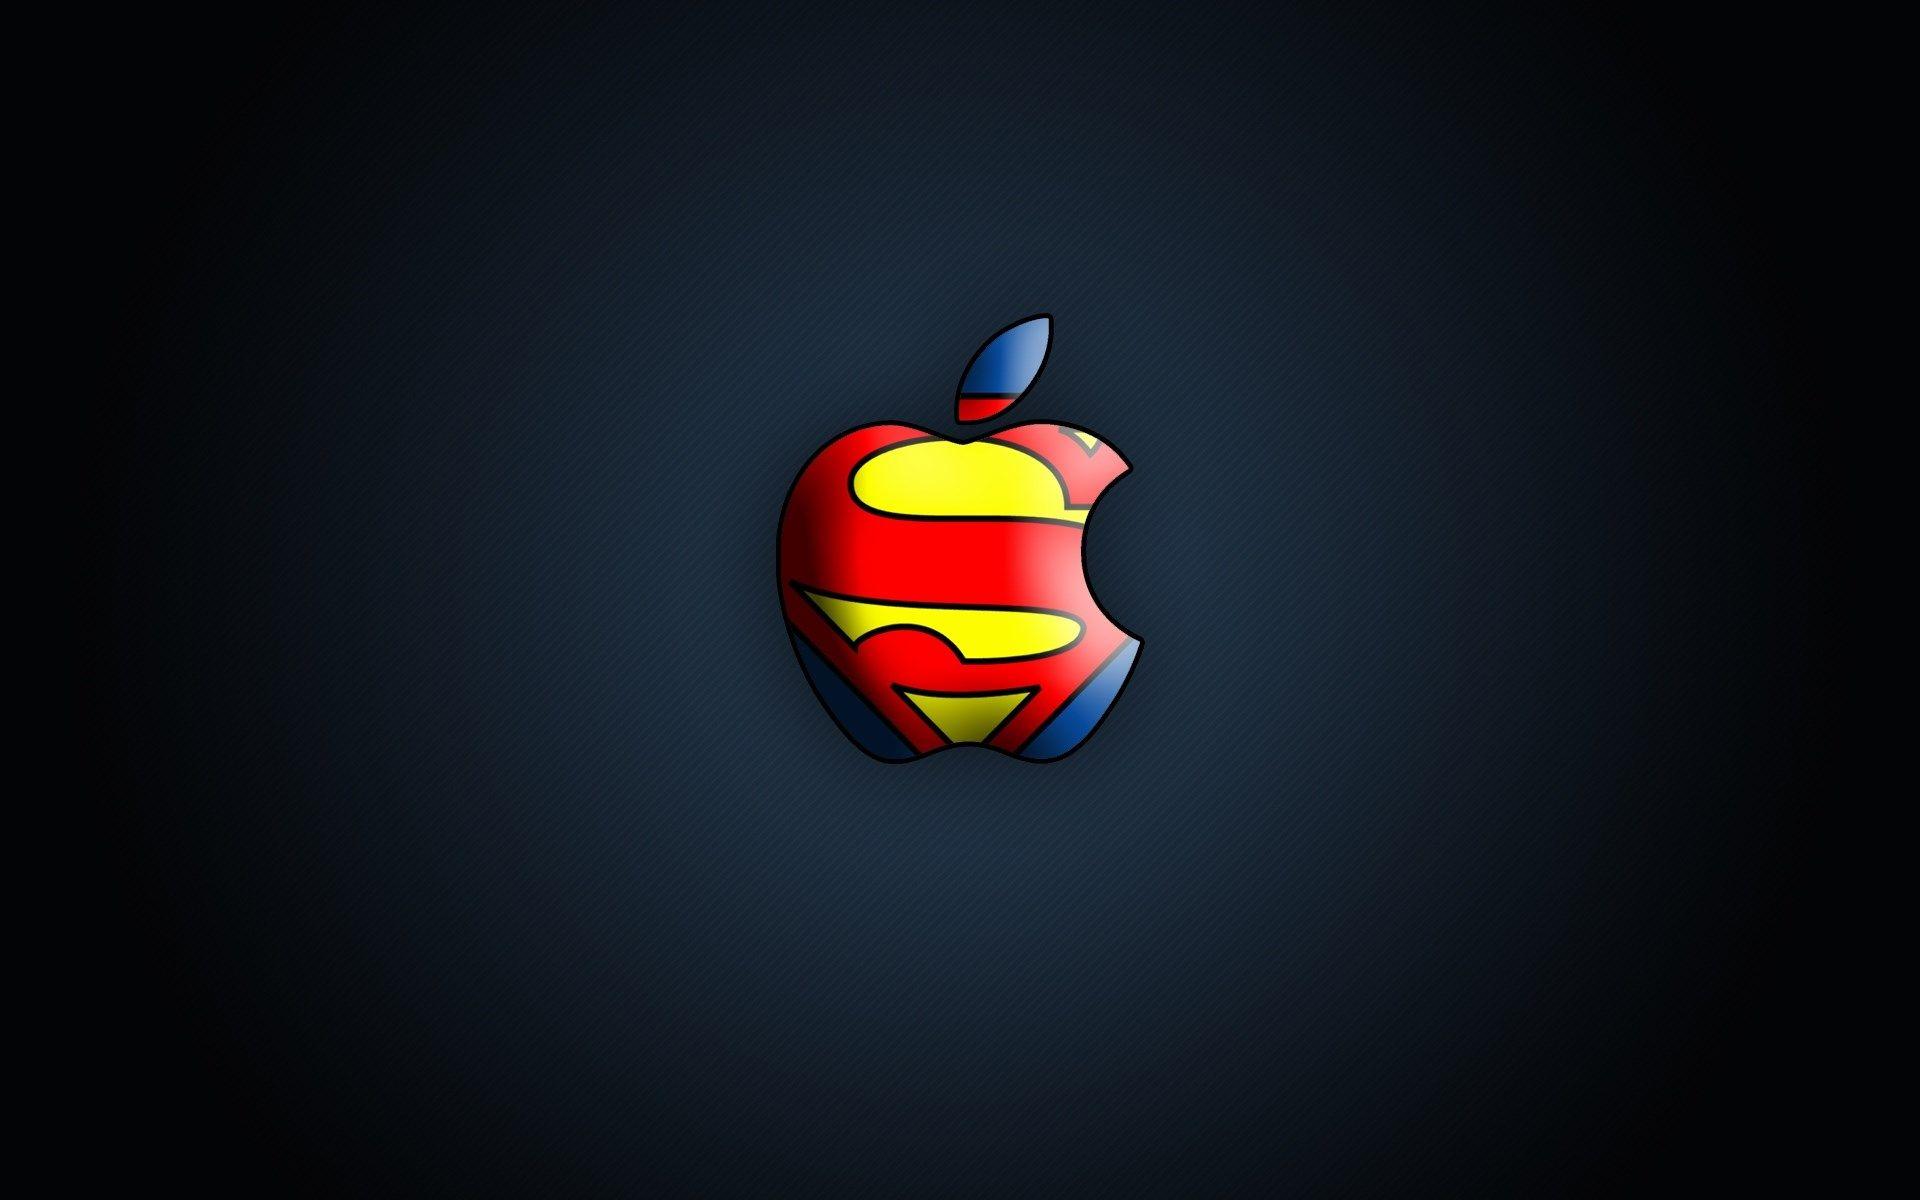 Official Apple Logo Wallpaper Hd Apple Logo Wallpaper Logo Wallpaper Hd Cool Apple Logo